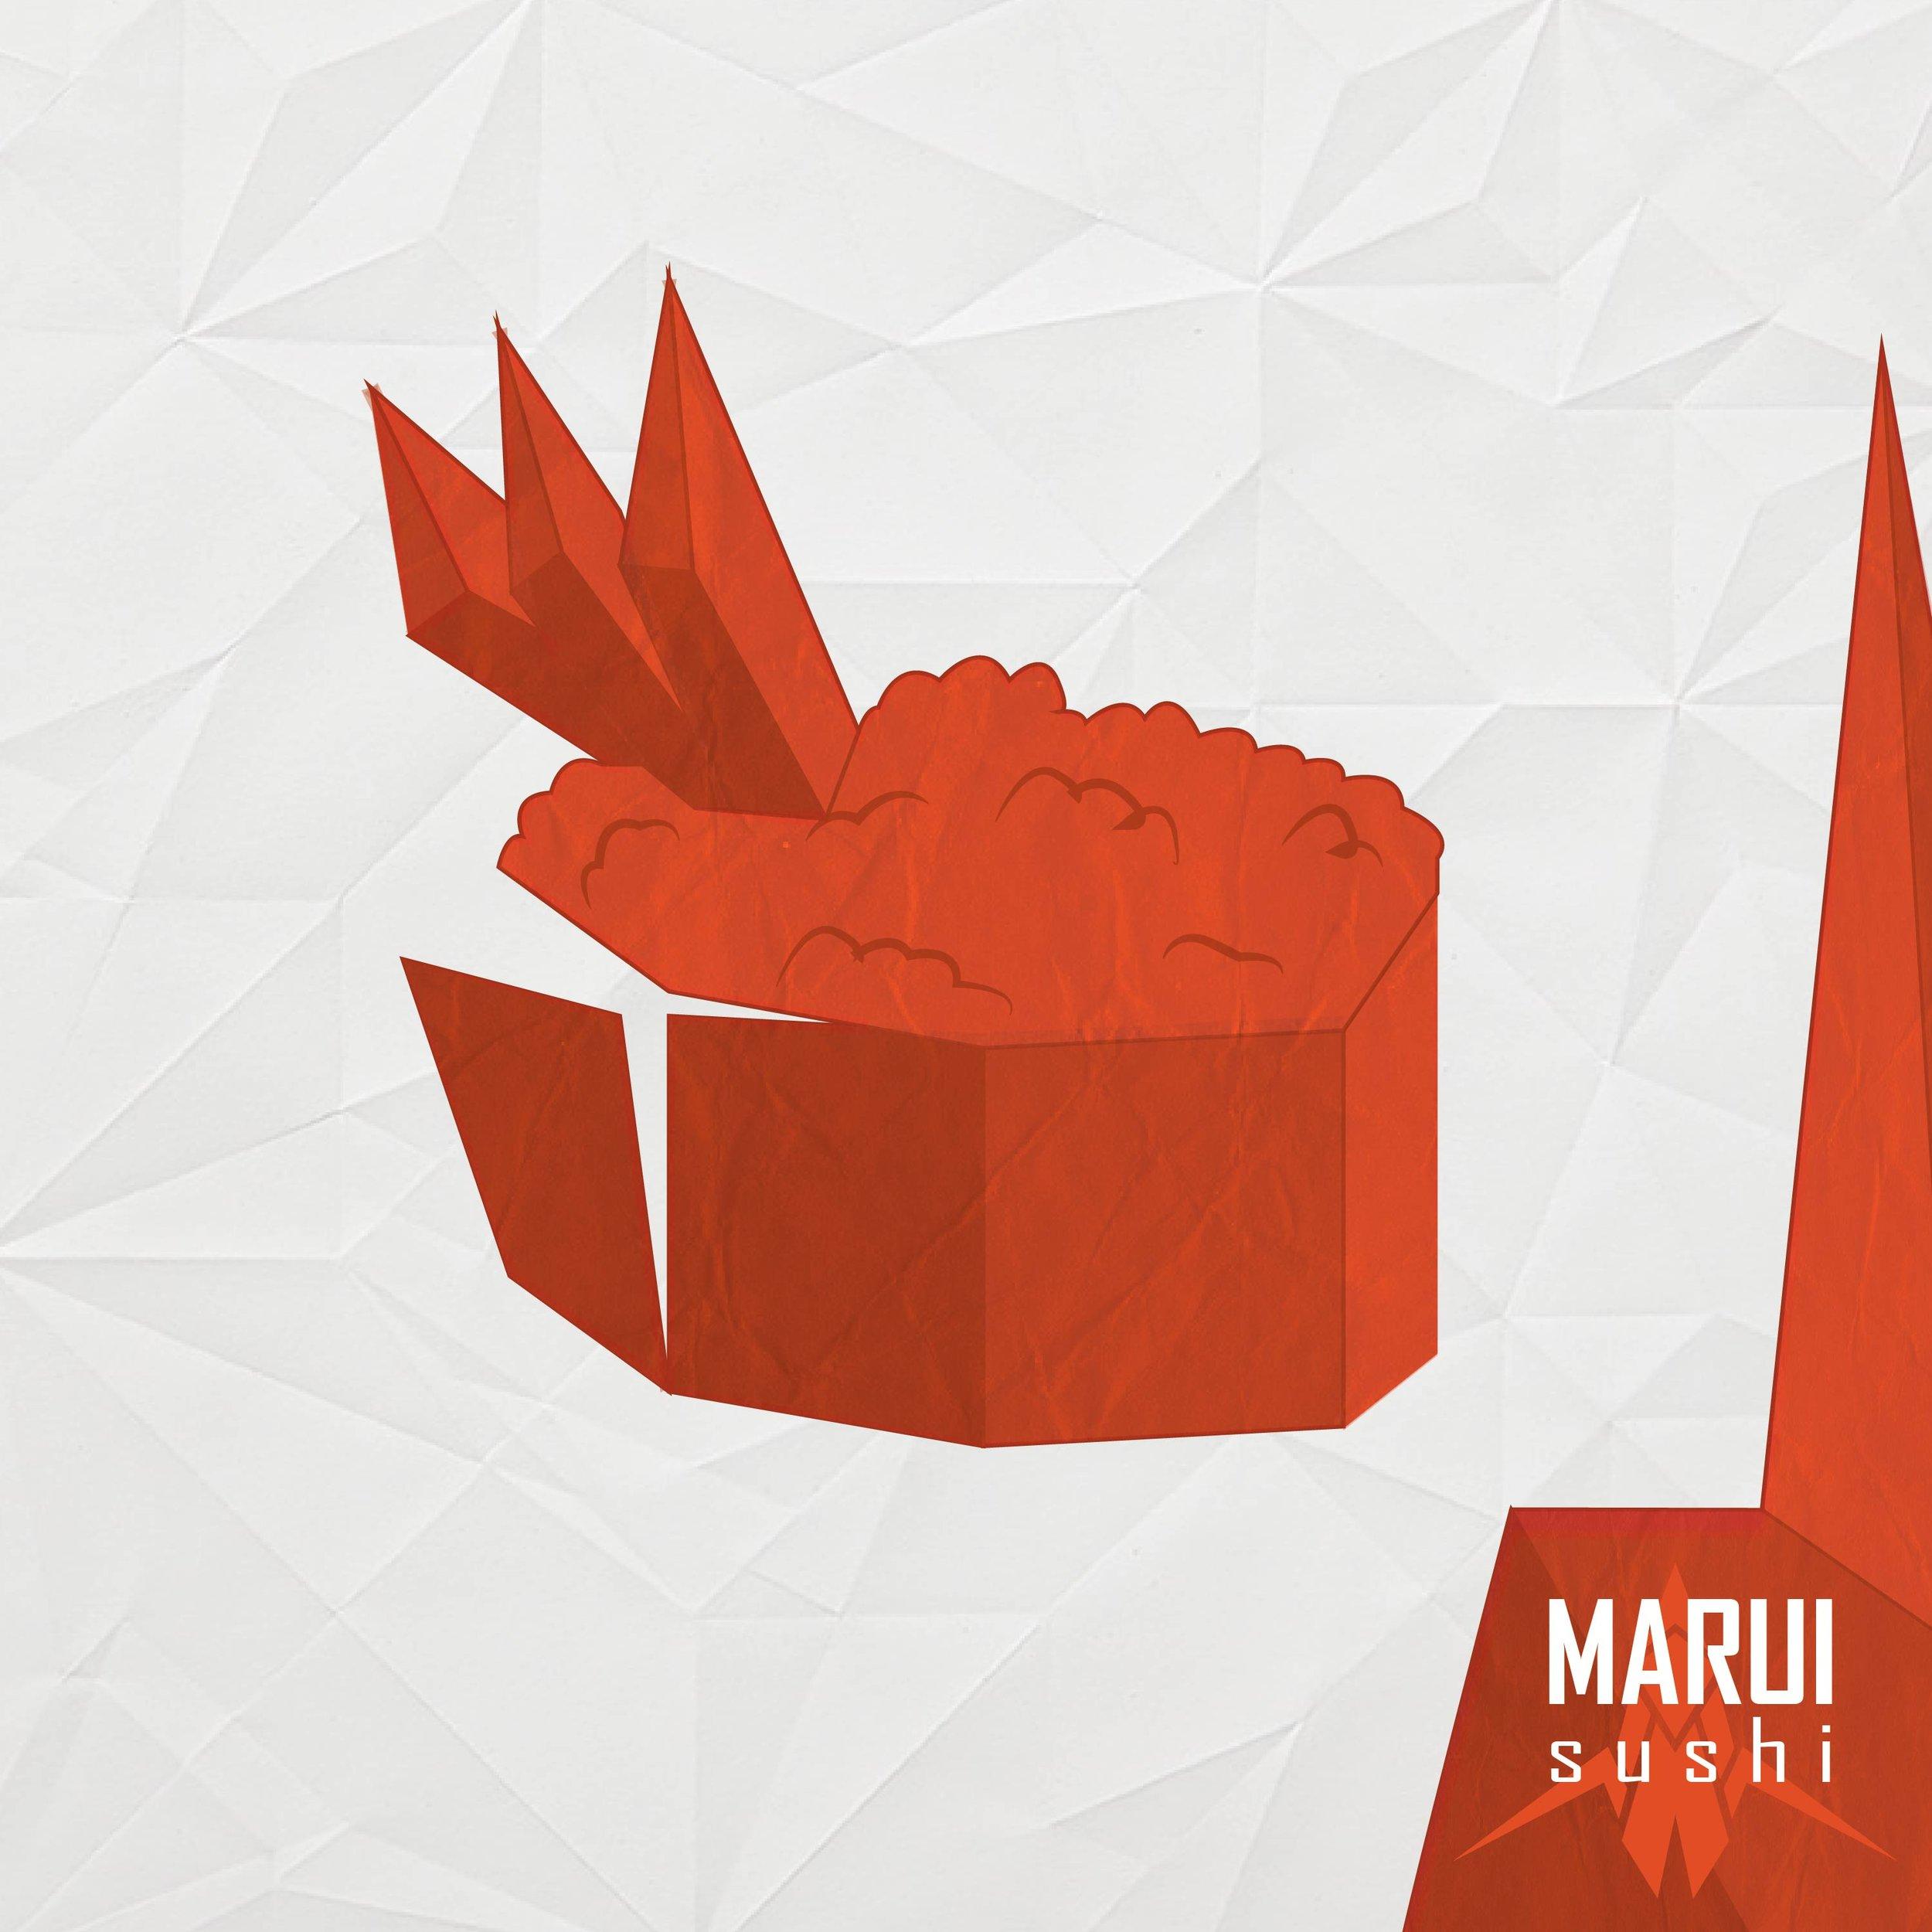 Marui Sushi Instagram Ads 1/6